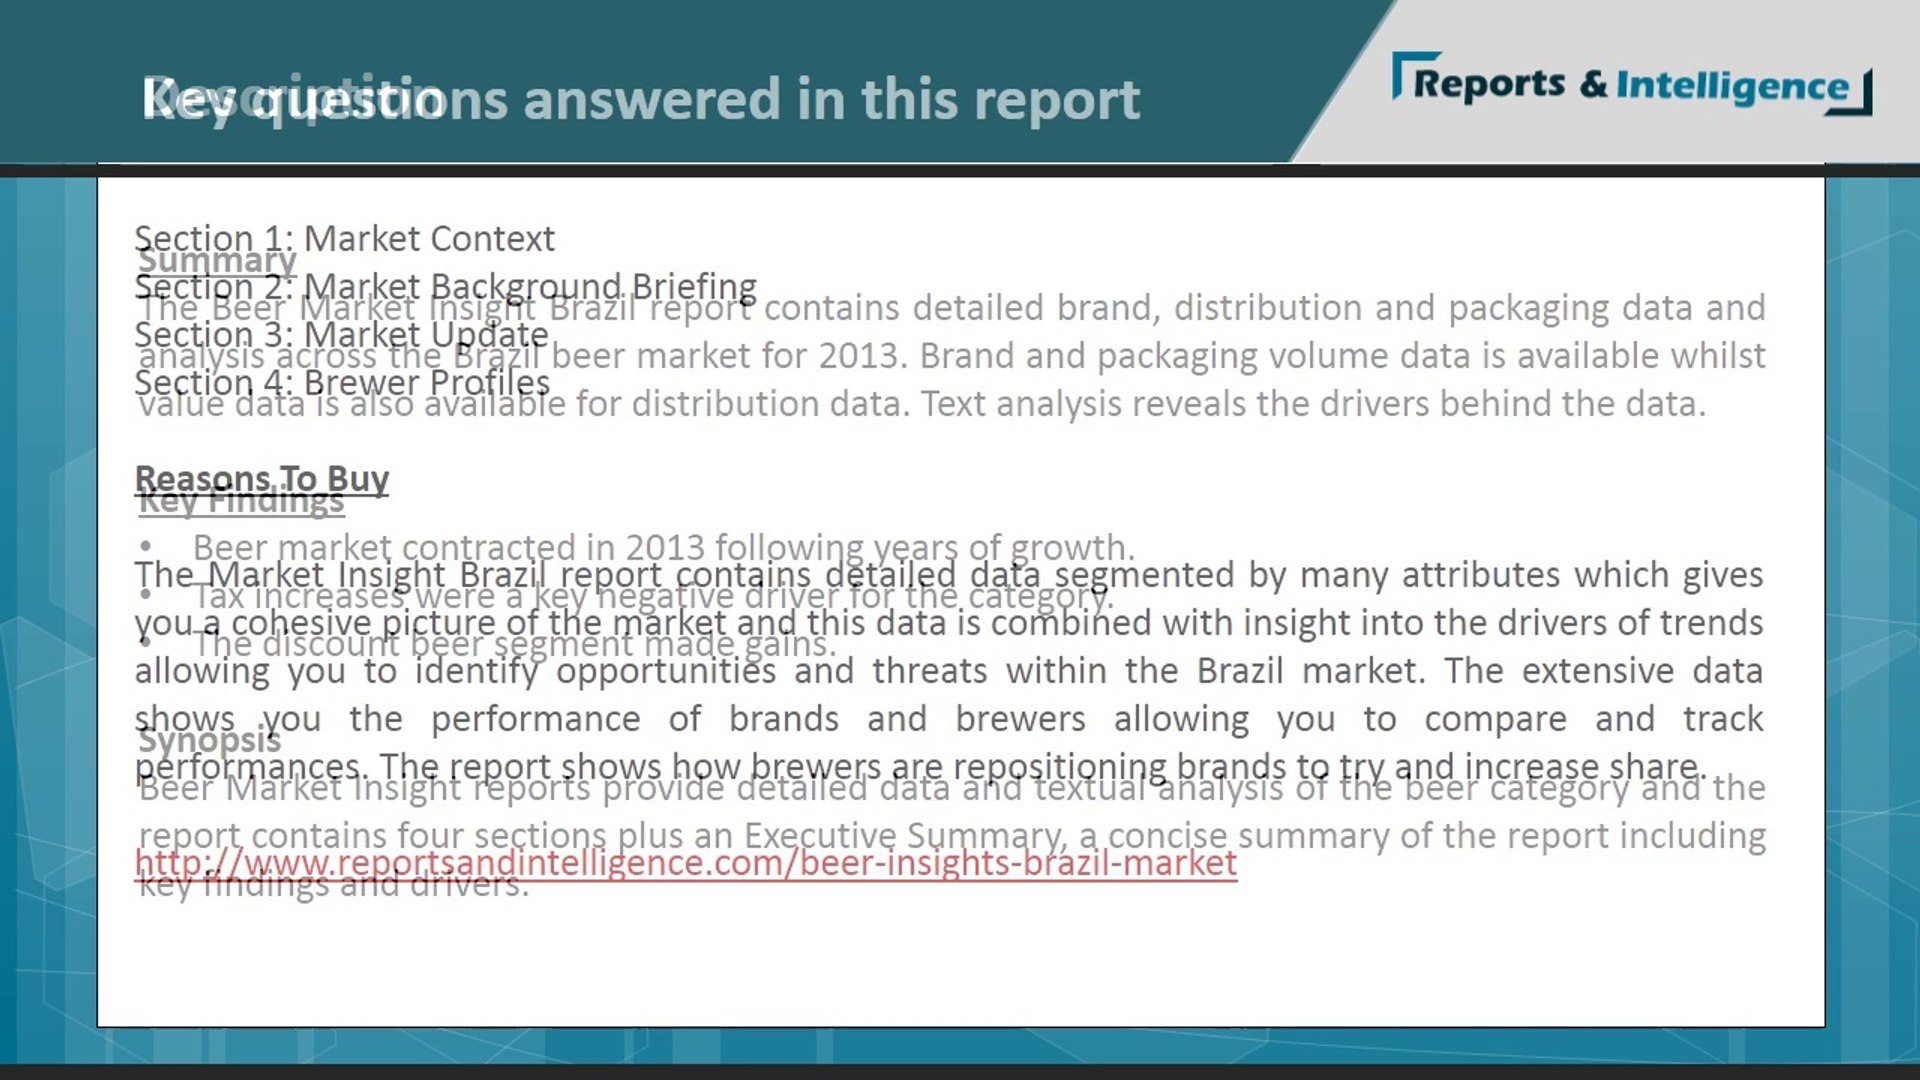 Brazil Beer Market, trends, forecasts, size, market analysis: Reportsandintelligence